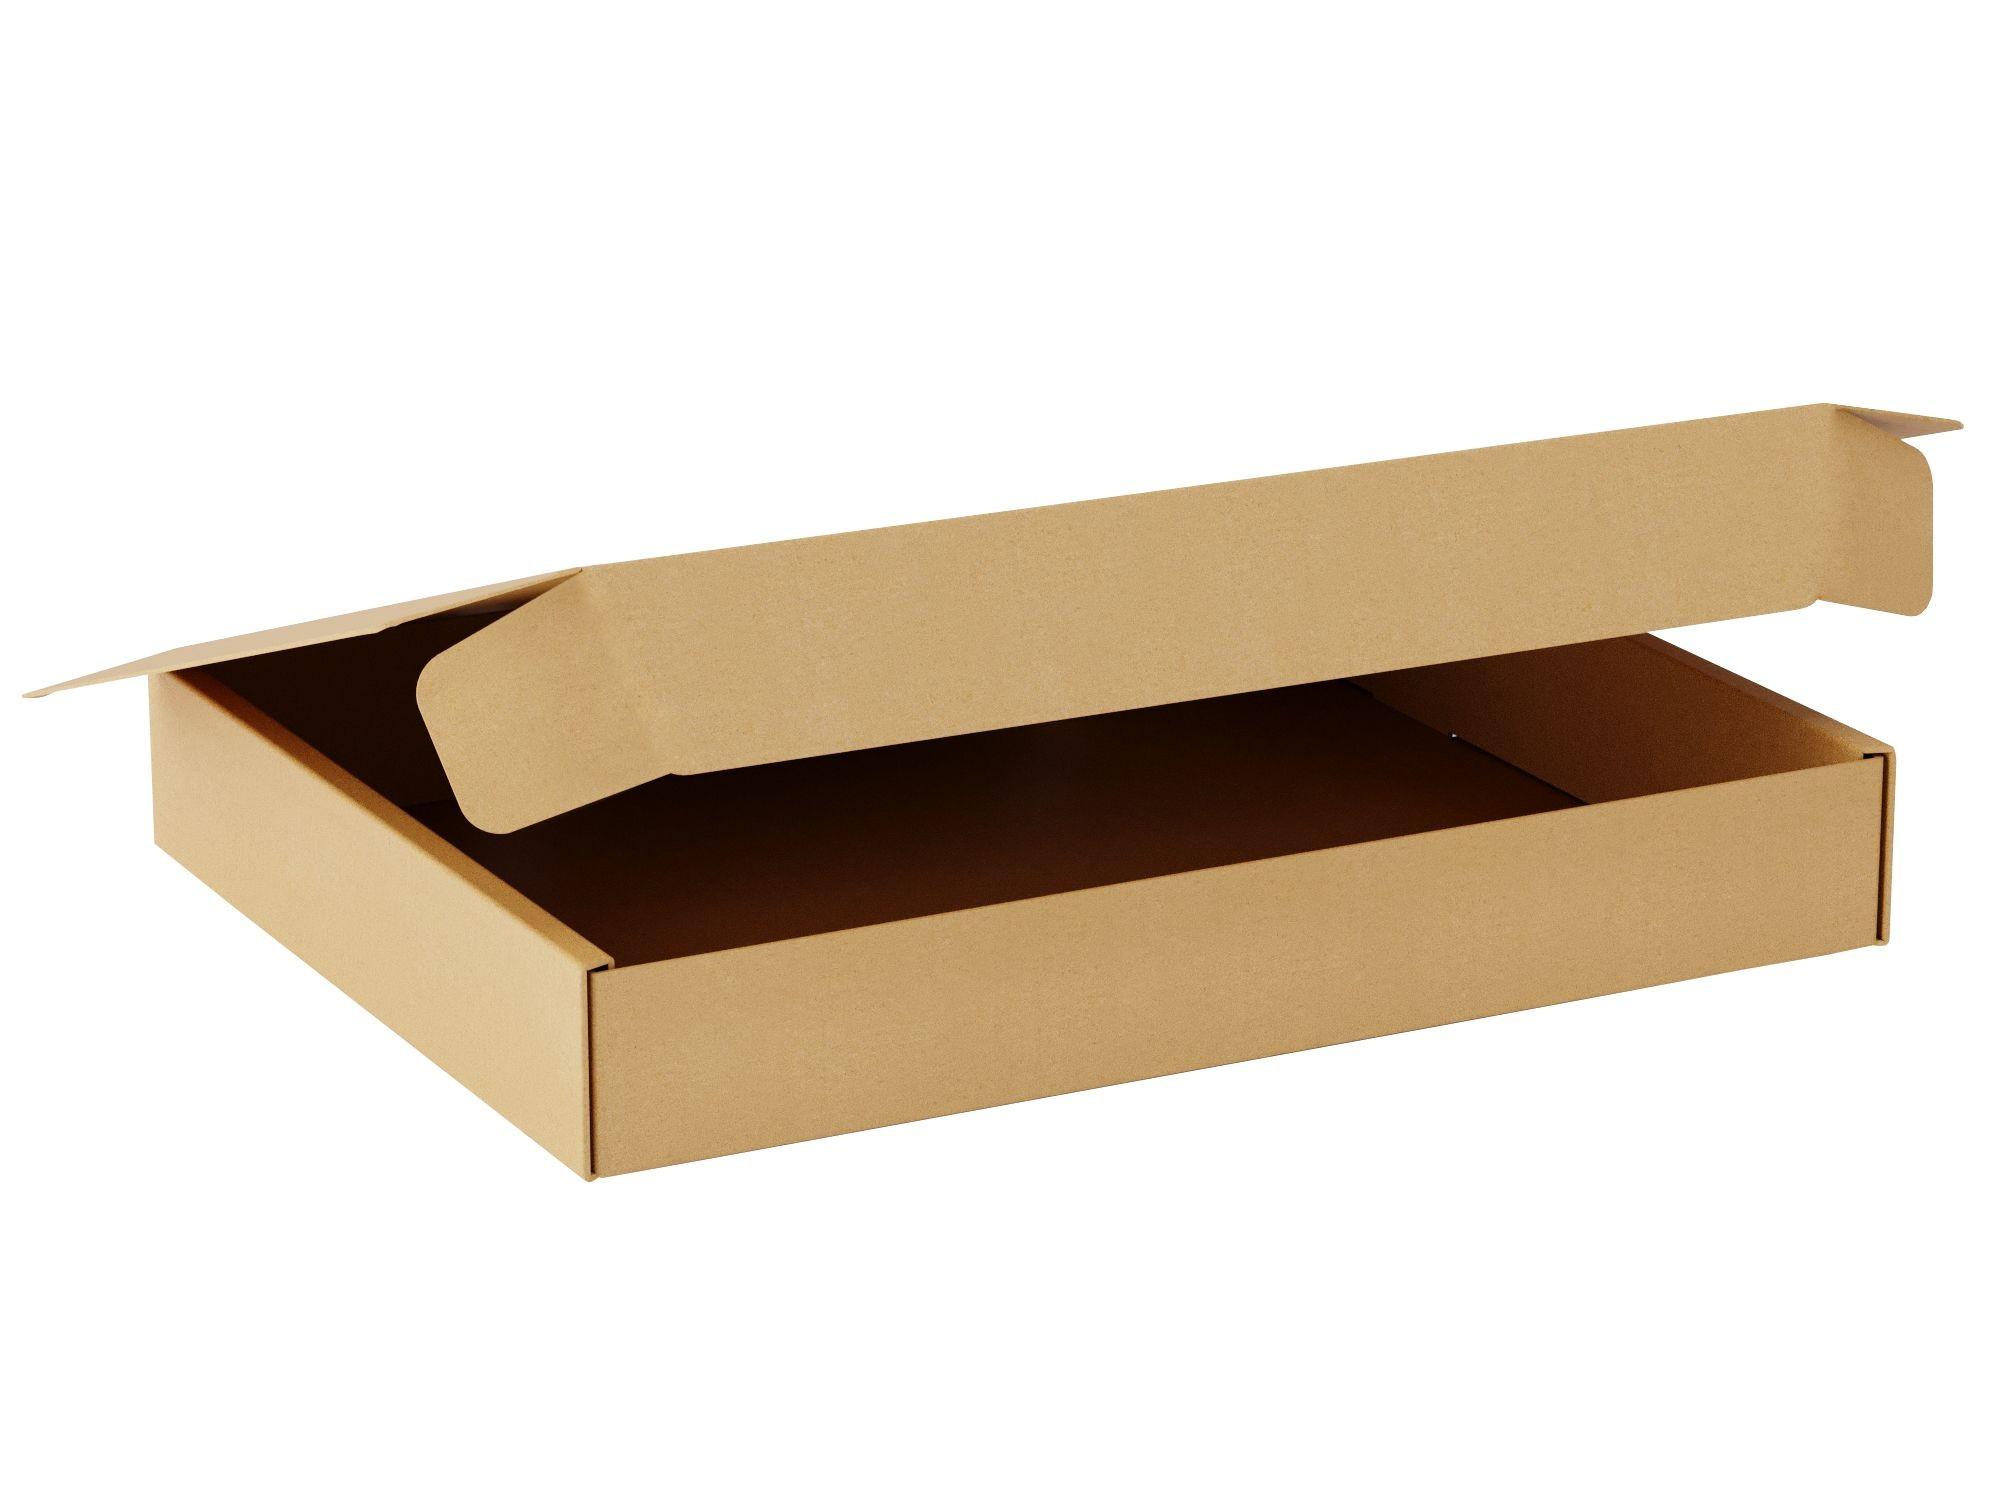 TOTALPACK® Ultra-Strong Single-Wall Interlock Die-cut, Cardboard Corrugated